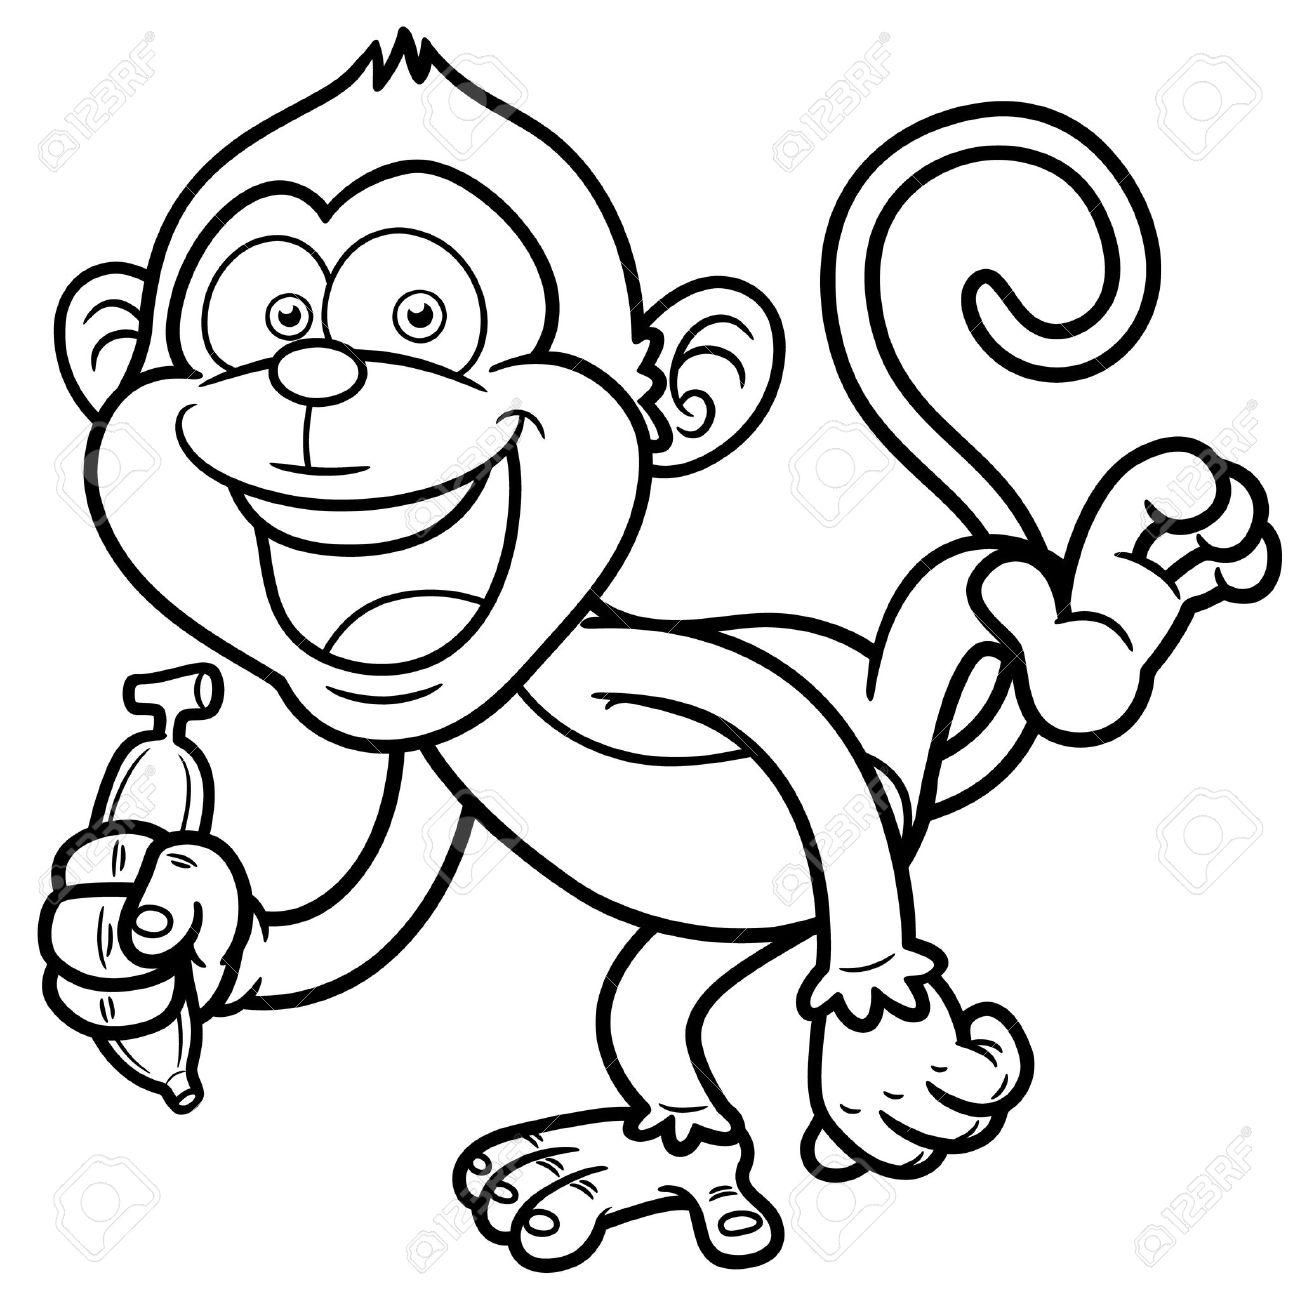 Best Monkey Outline #16613.